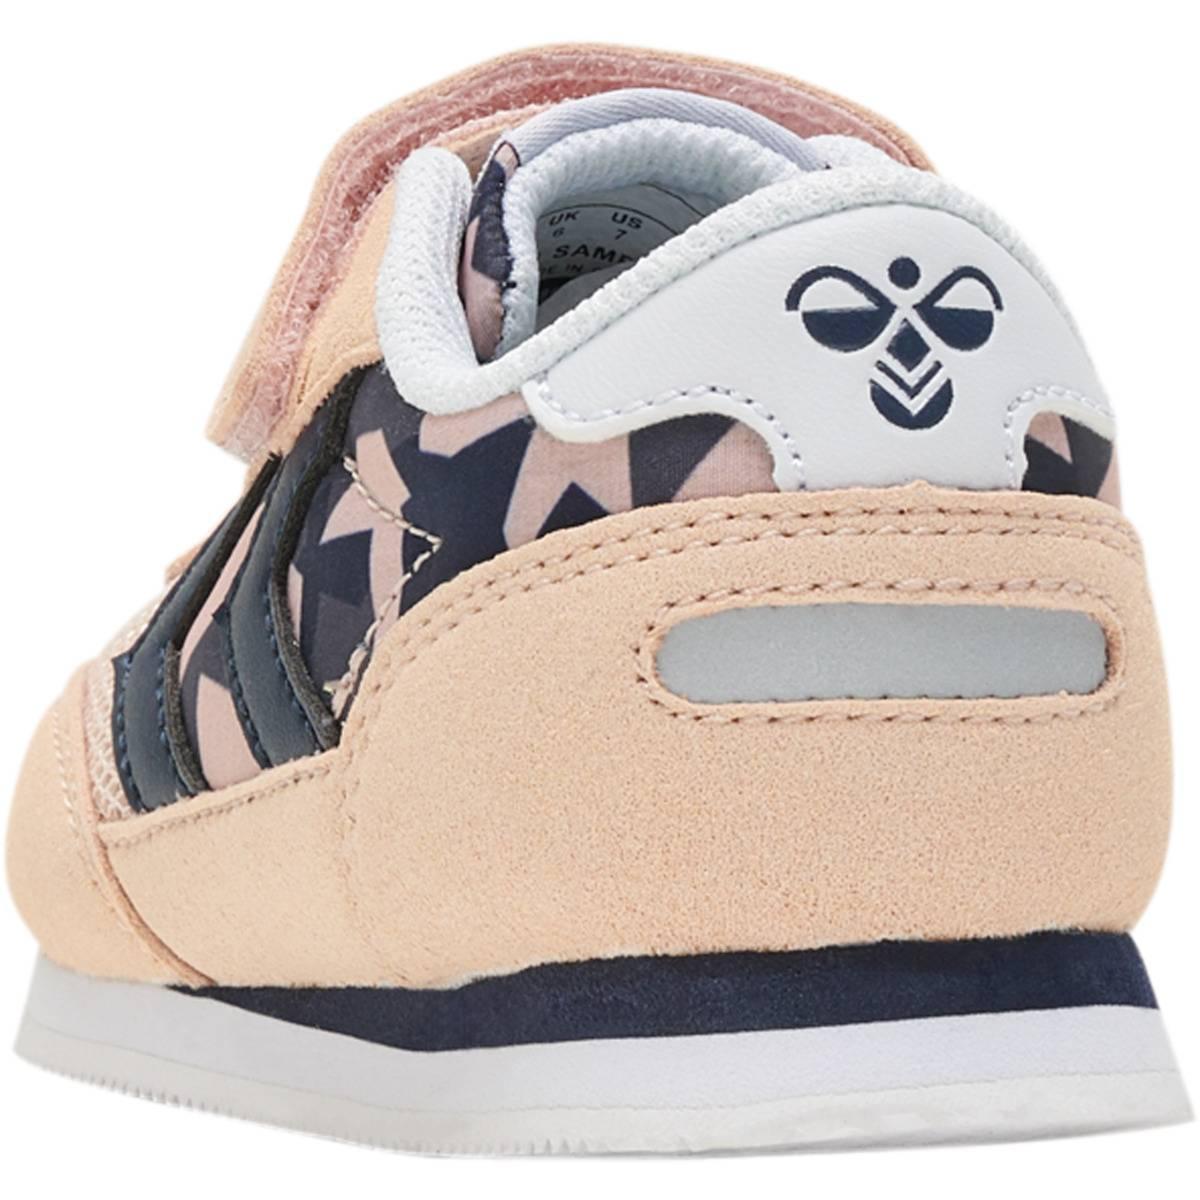 Hummel Reflex infant - pink